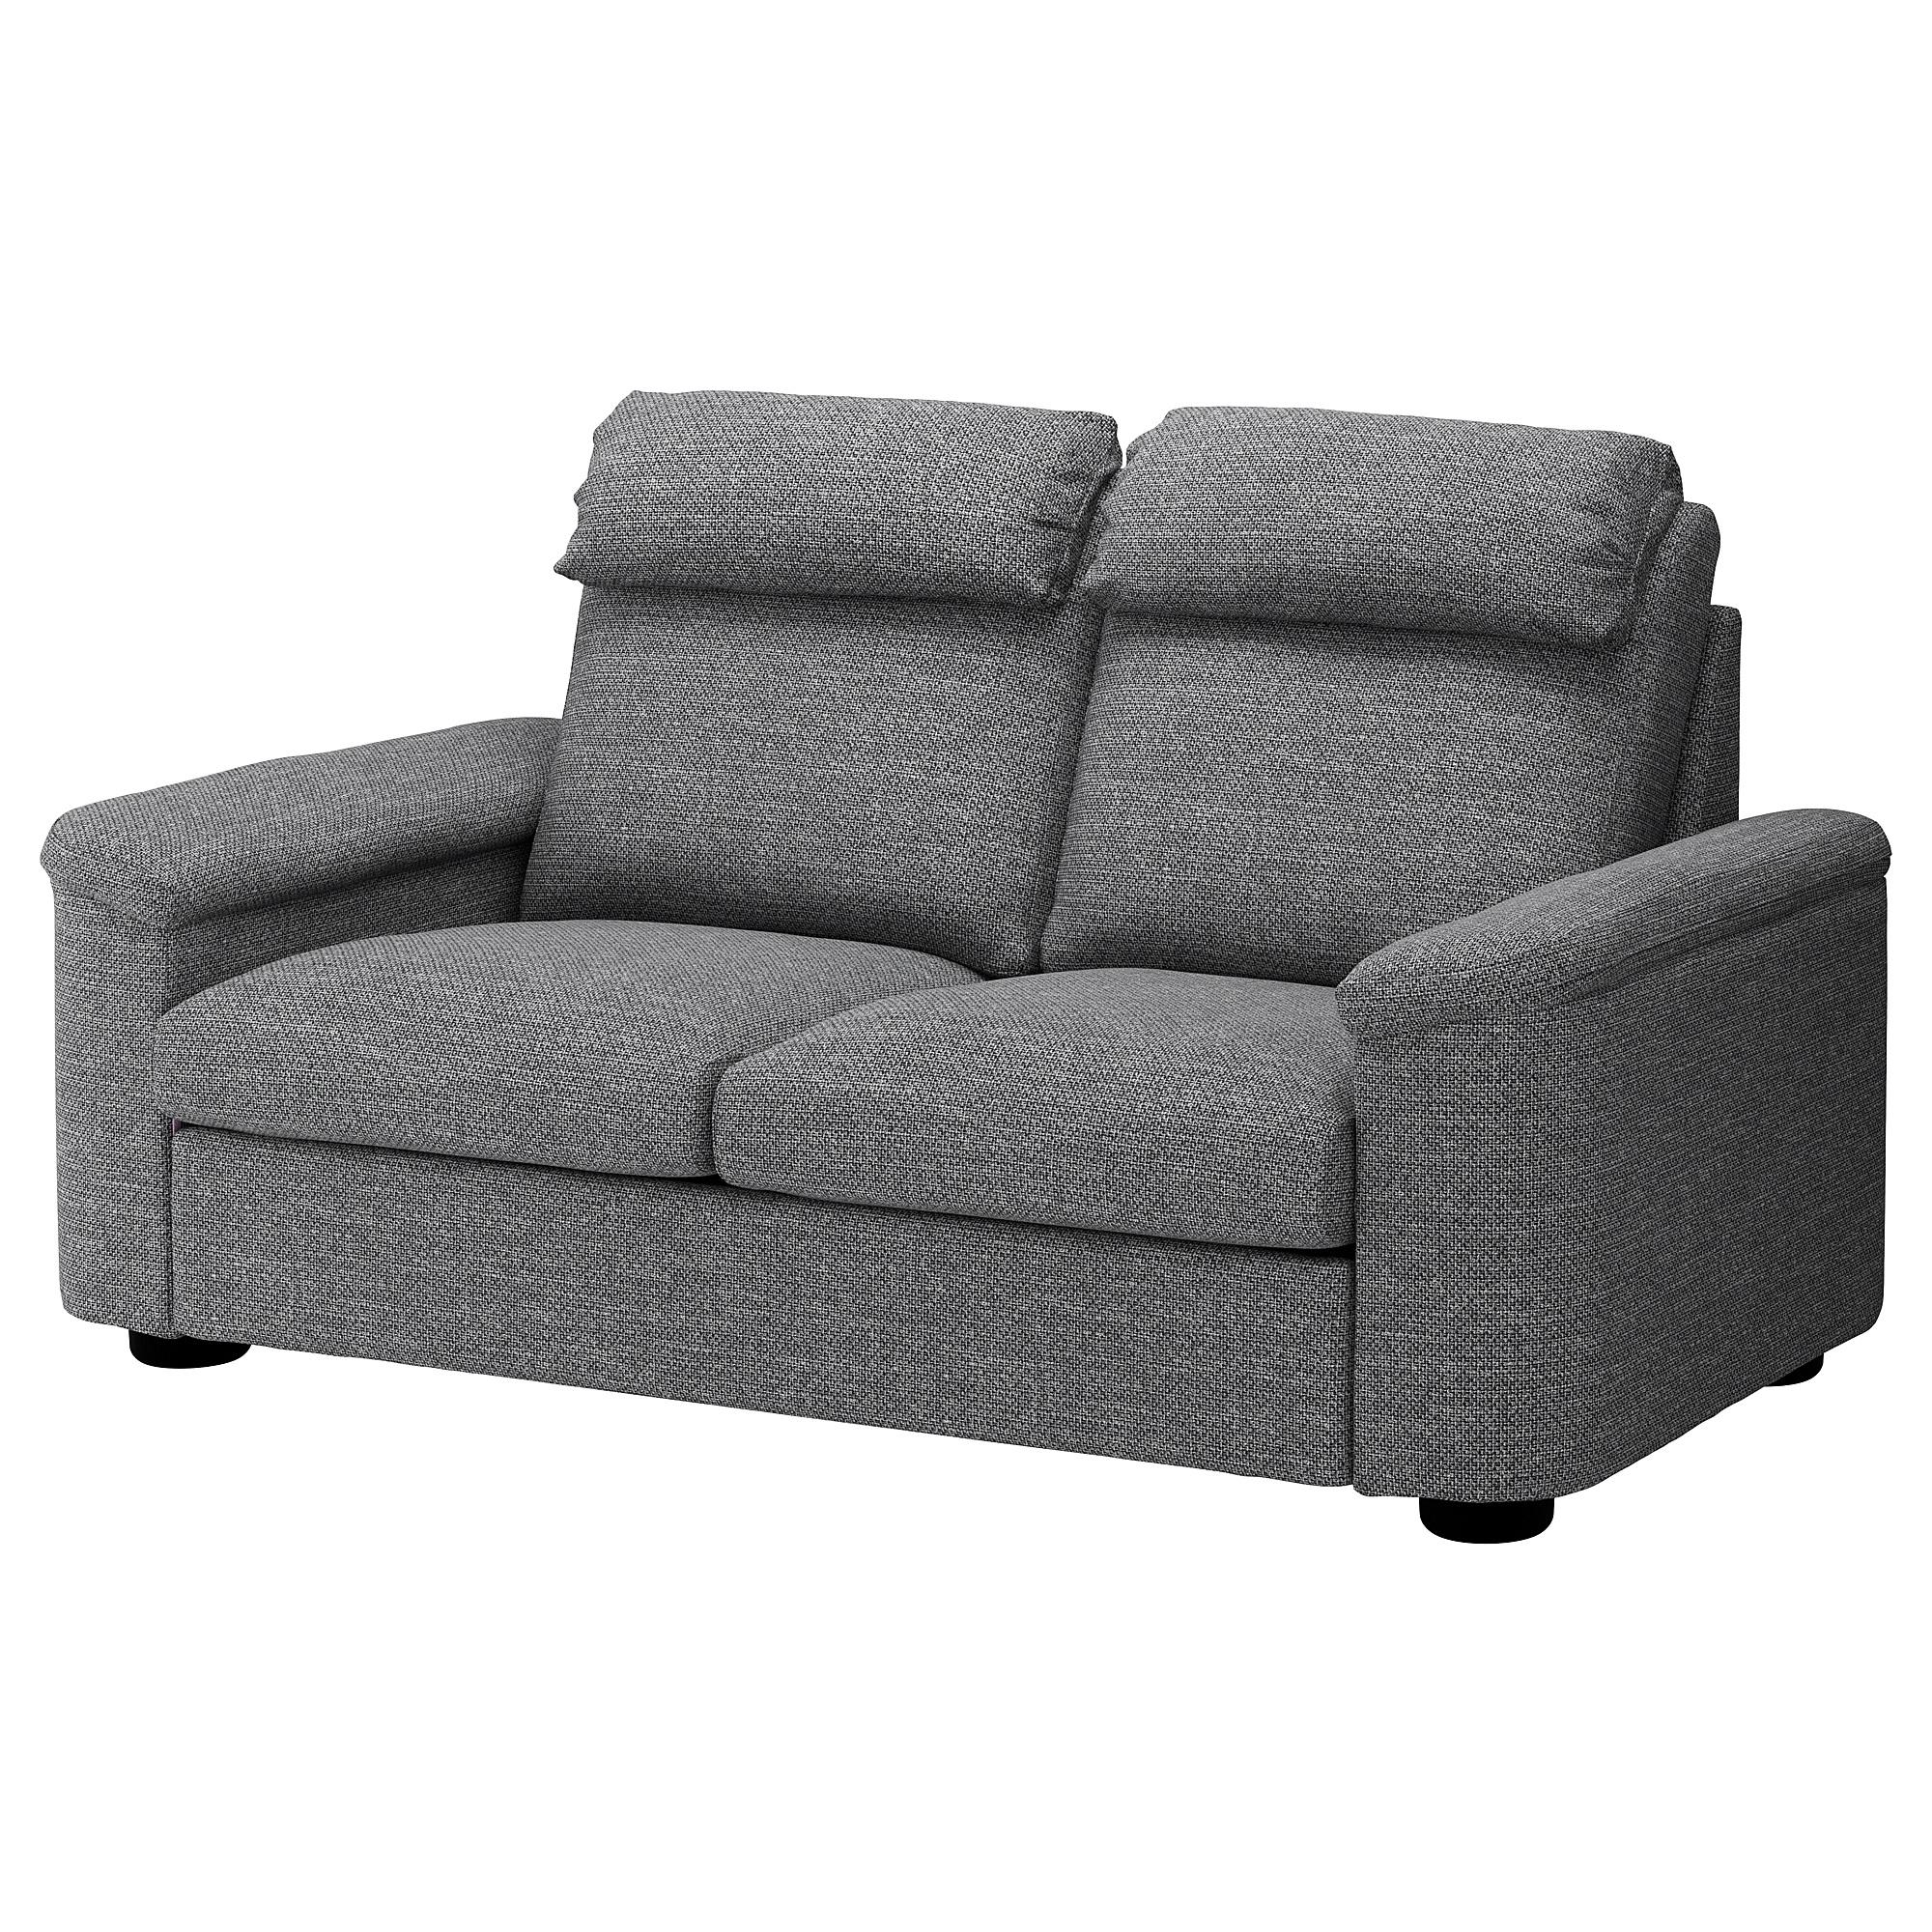 LIDHULT 2-seat sofa-bed